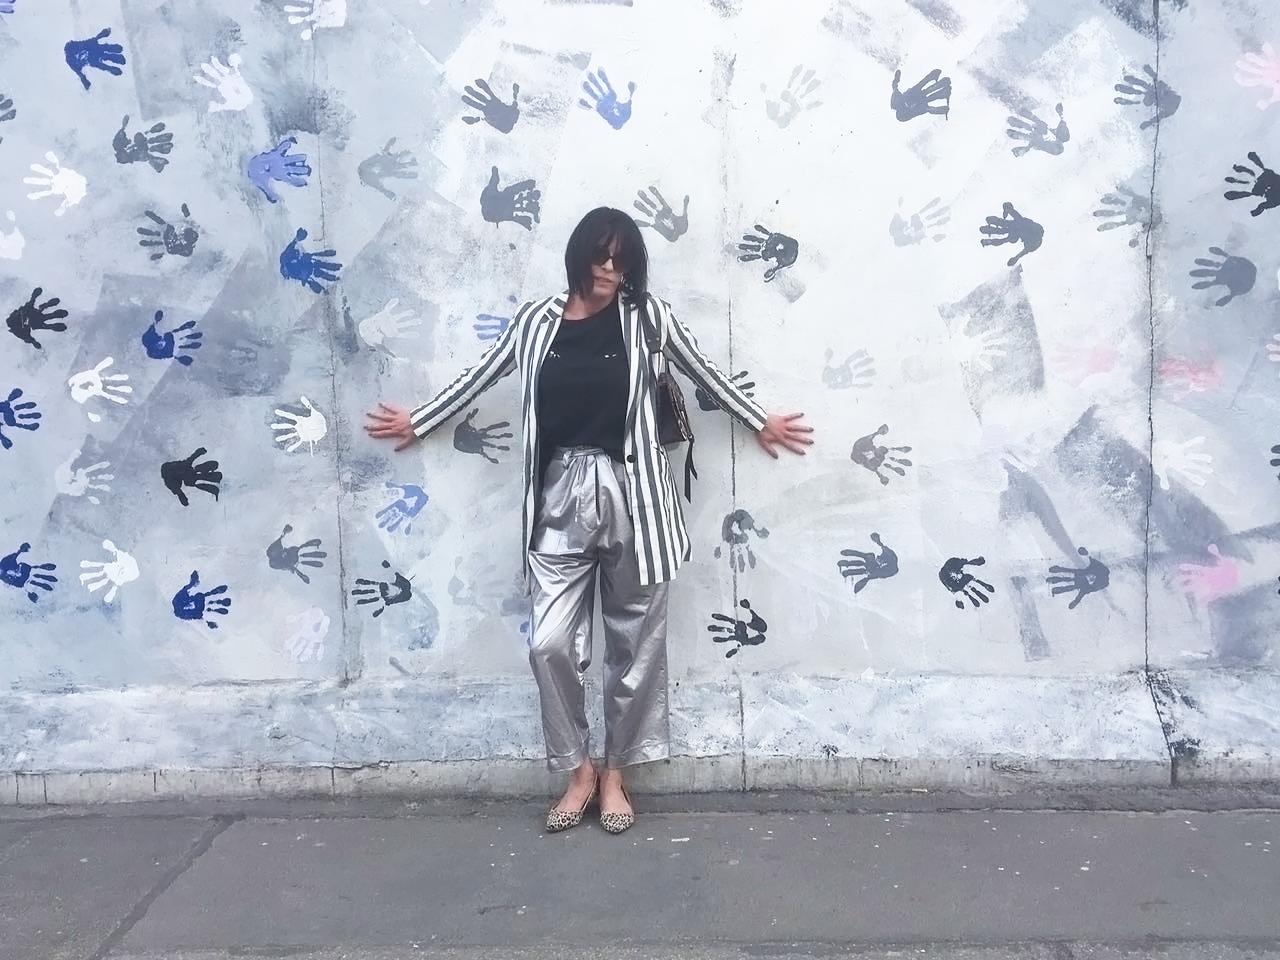 Just-take-a-look Berlin - Jahresrückblick 2018 Outfit - Diversity 1